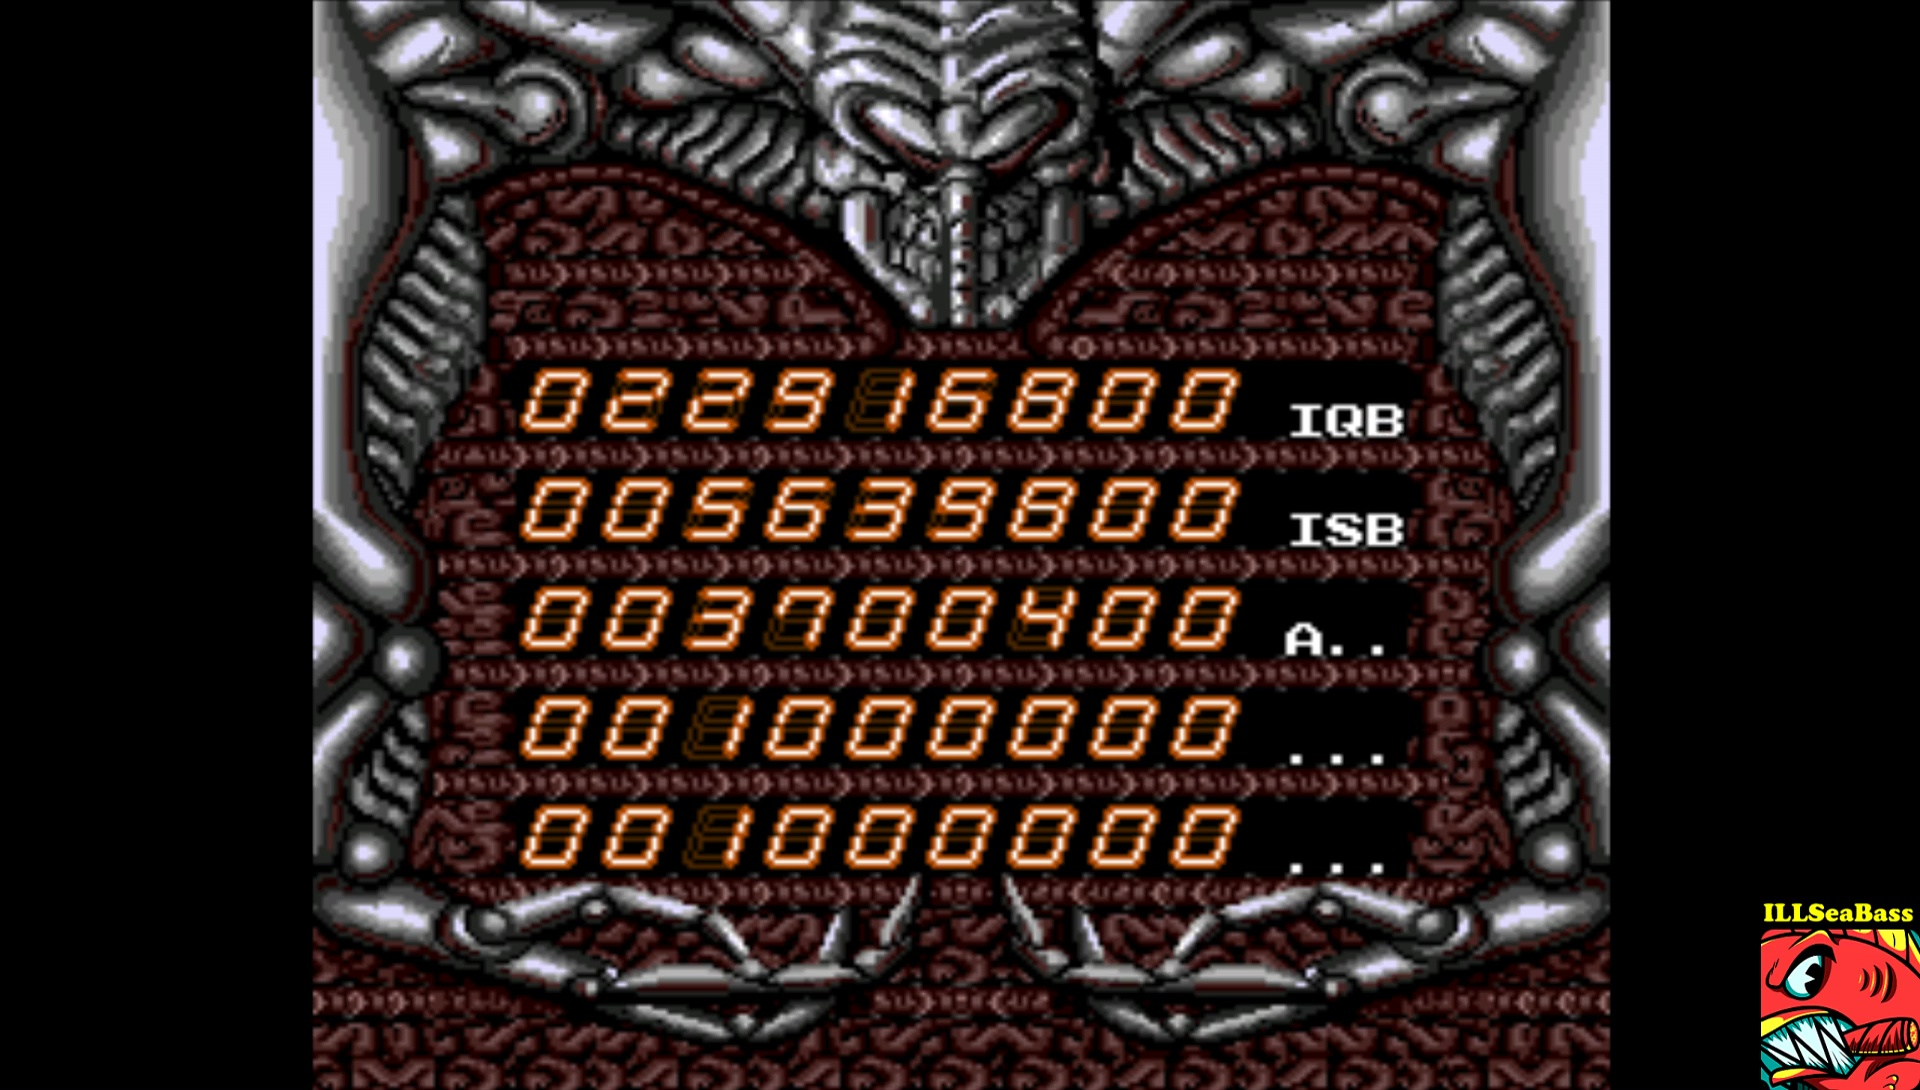 ILLSeaBass: Alien Crush (TurboGrafx-16/PC Engine Emulated) 22,916,800 points on 2017-02-03 22:12:19